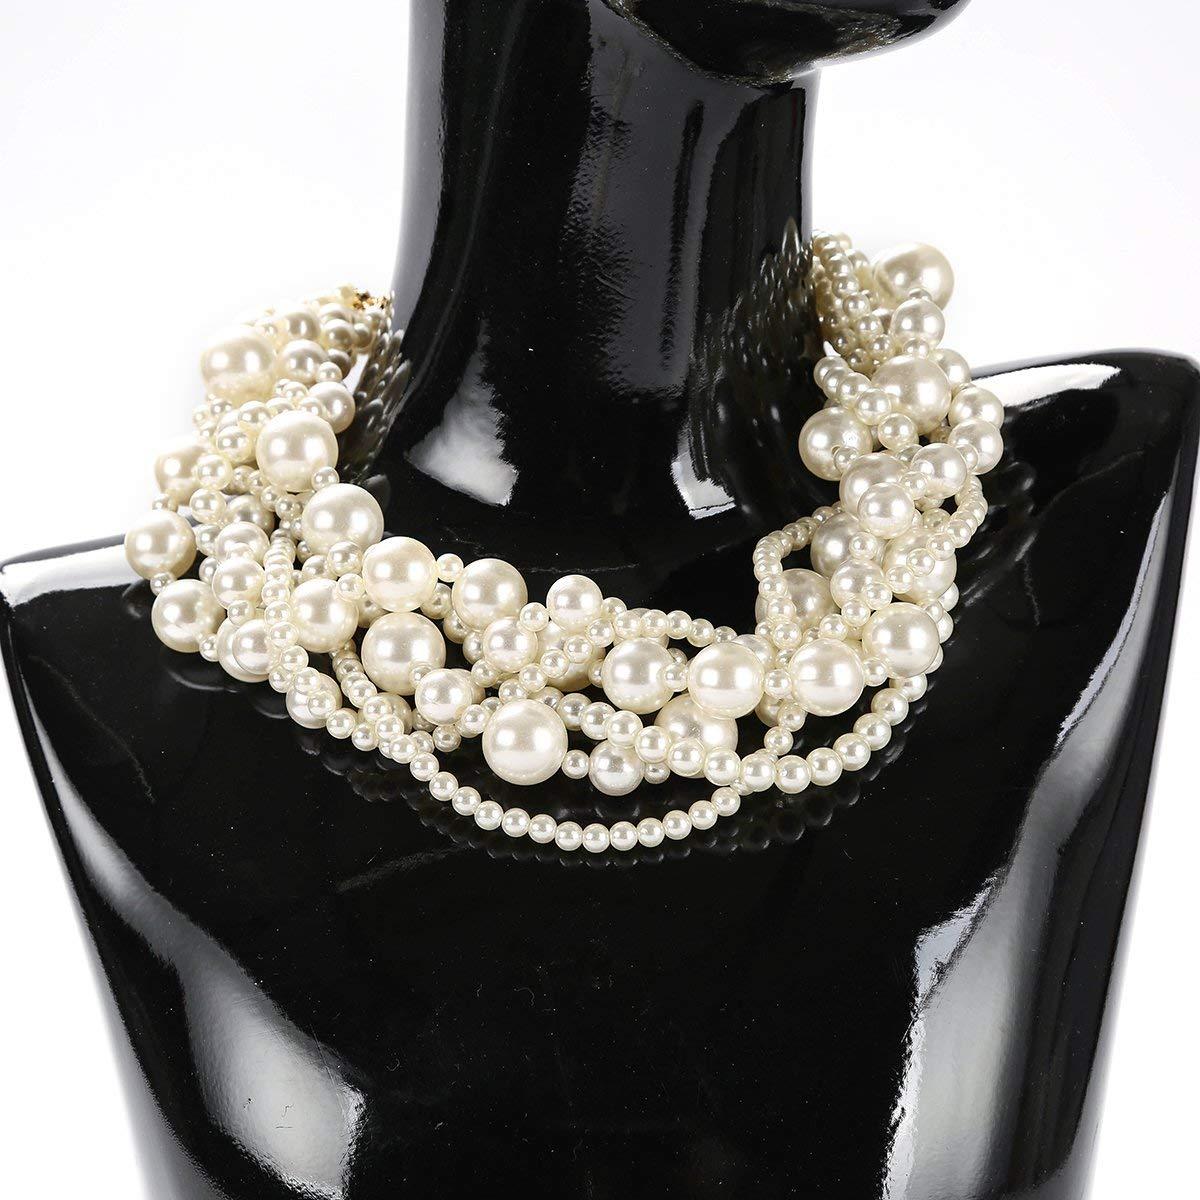 We We Fashion Imitation Pearl Necklace Choker Chunky Statement Bib Necklace